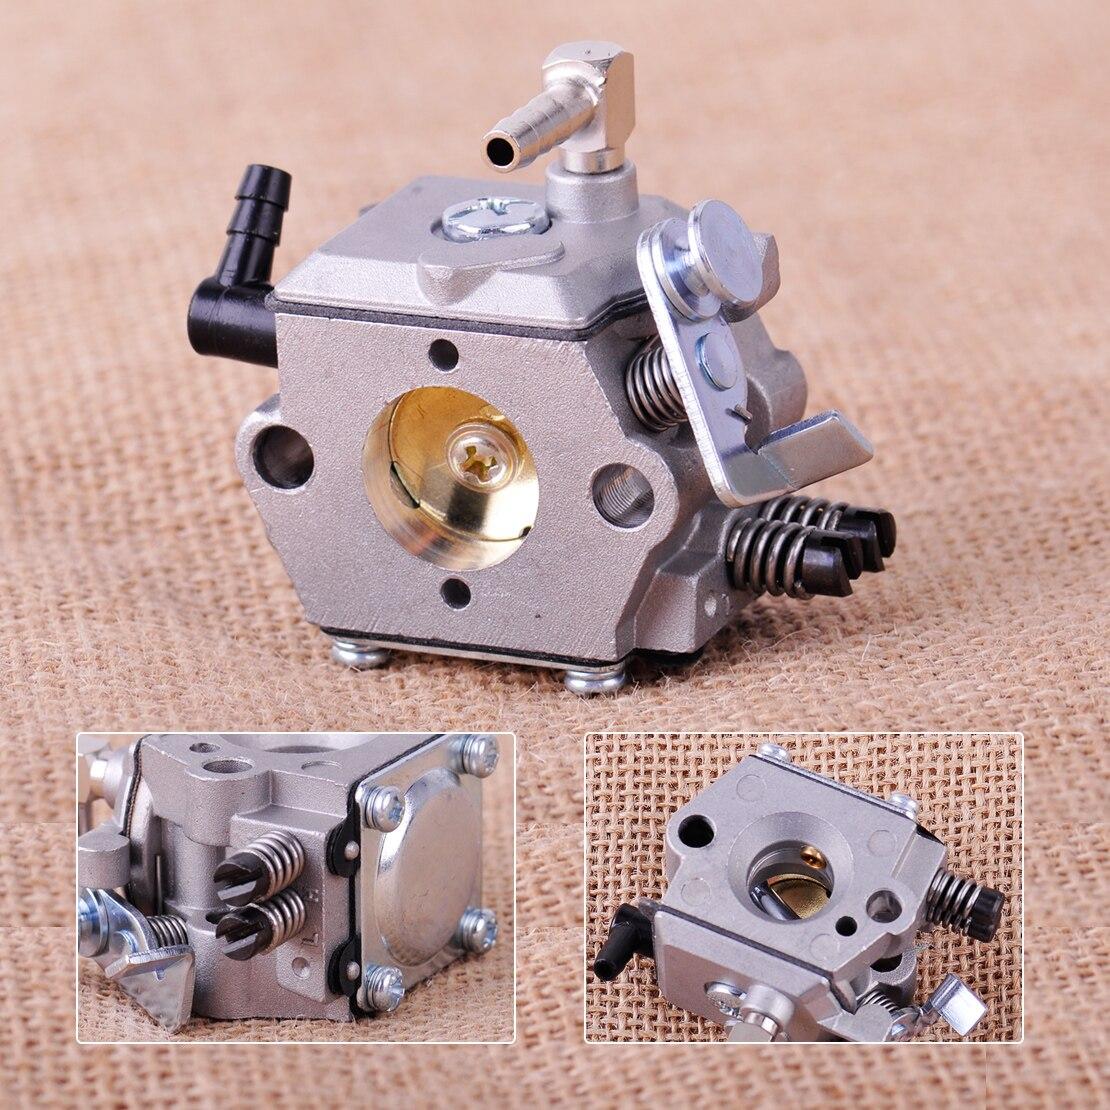 LETAOSK Carburetor Carb Fit For Tillotson HU-40D Stihl 028 028AV Super Chainsaw 11181200600 WT-16B